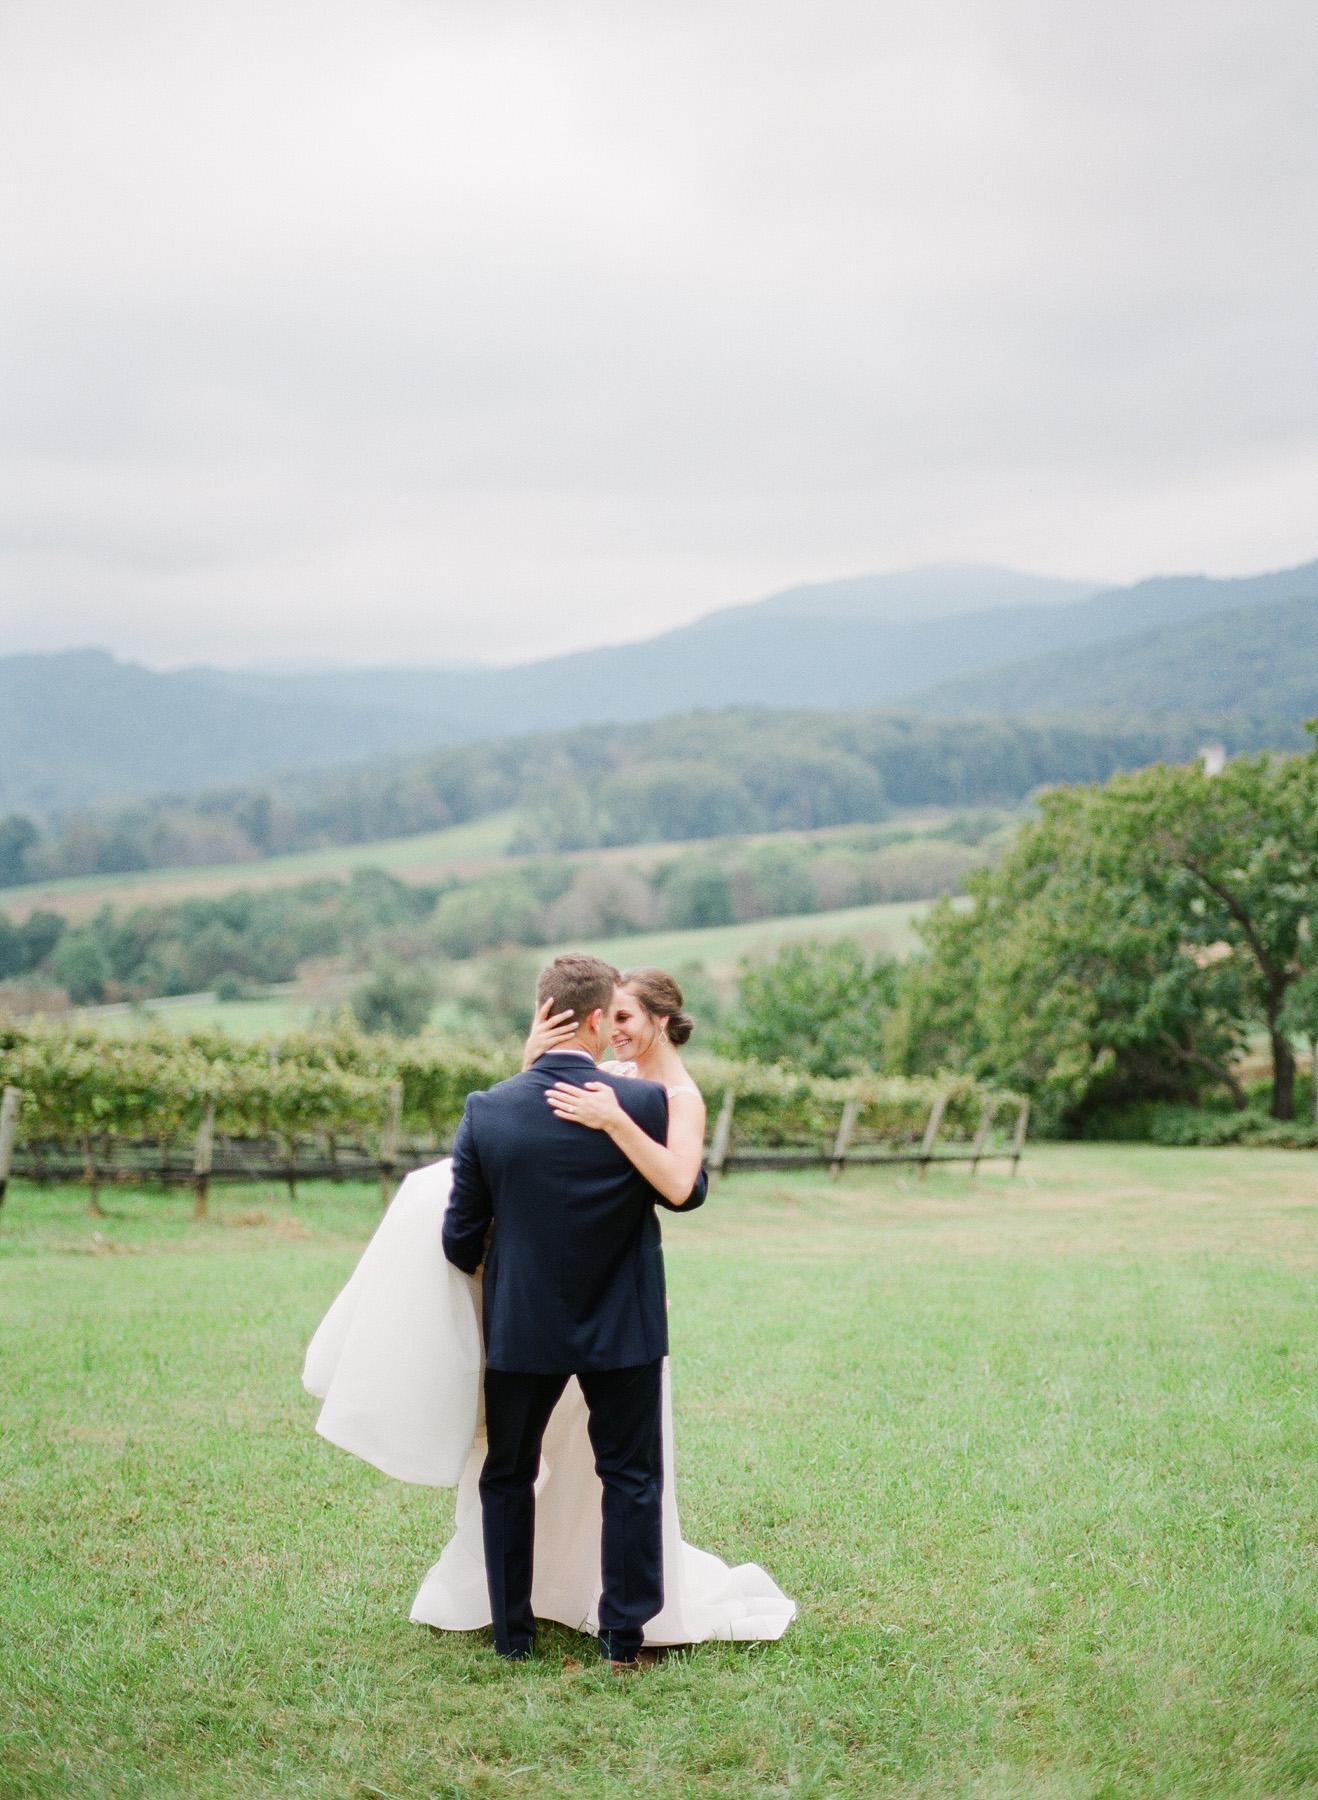 Pippin-Hill-Farm-and-Vinyards-Wedding-Film-Photography-27.jpg